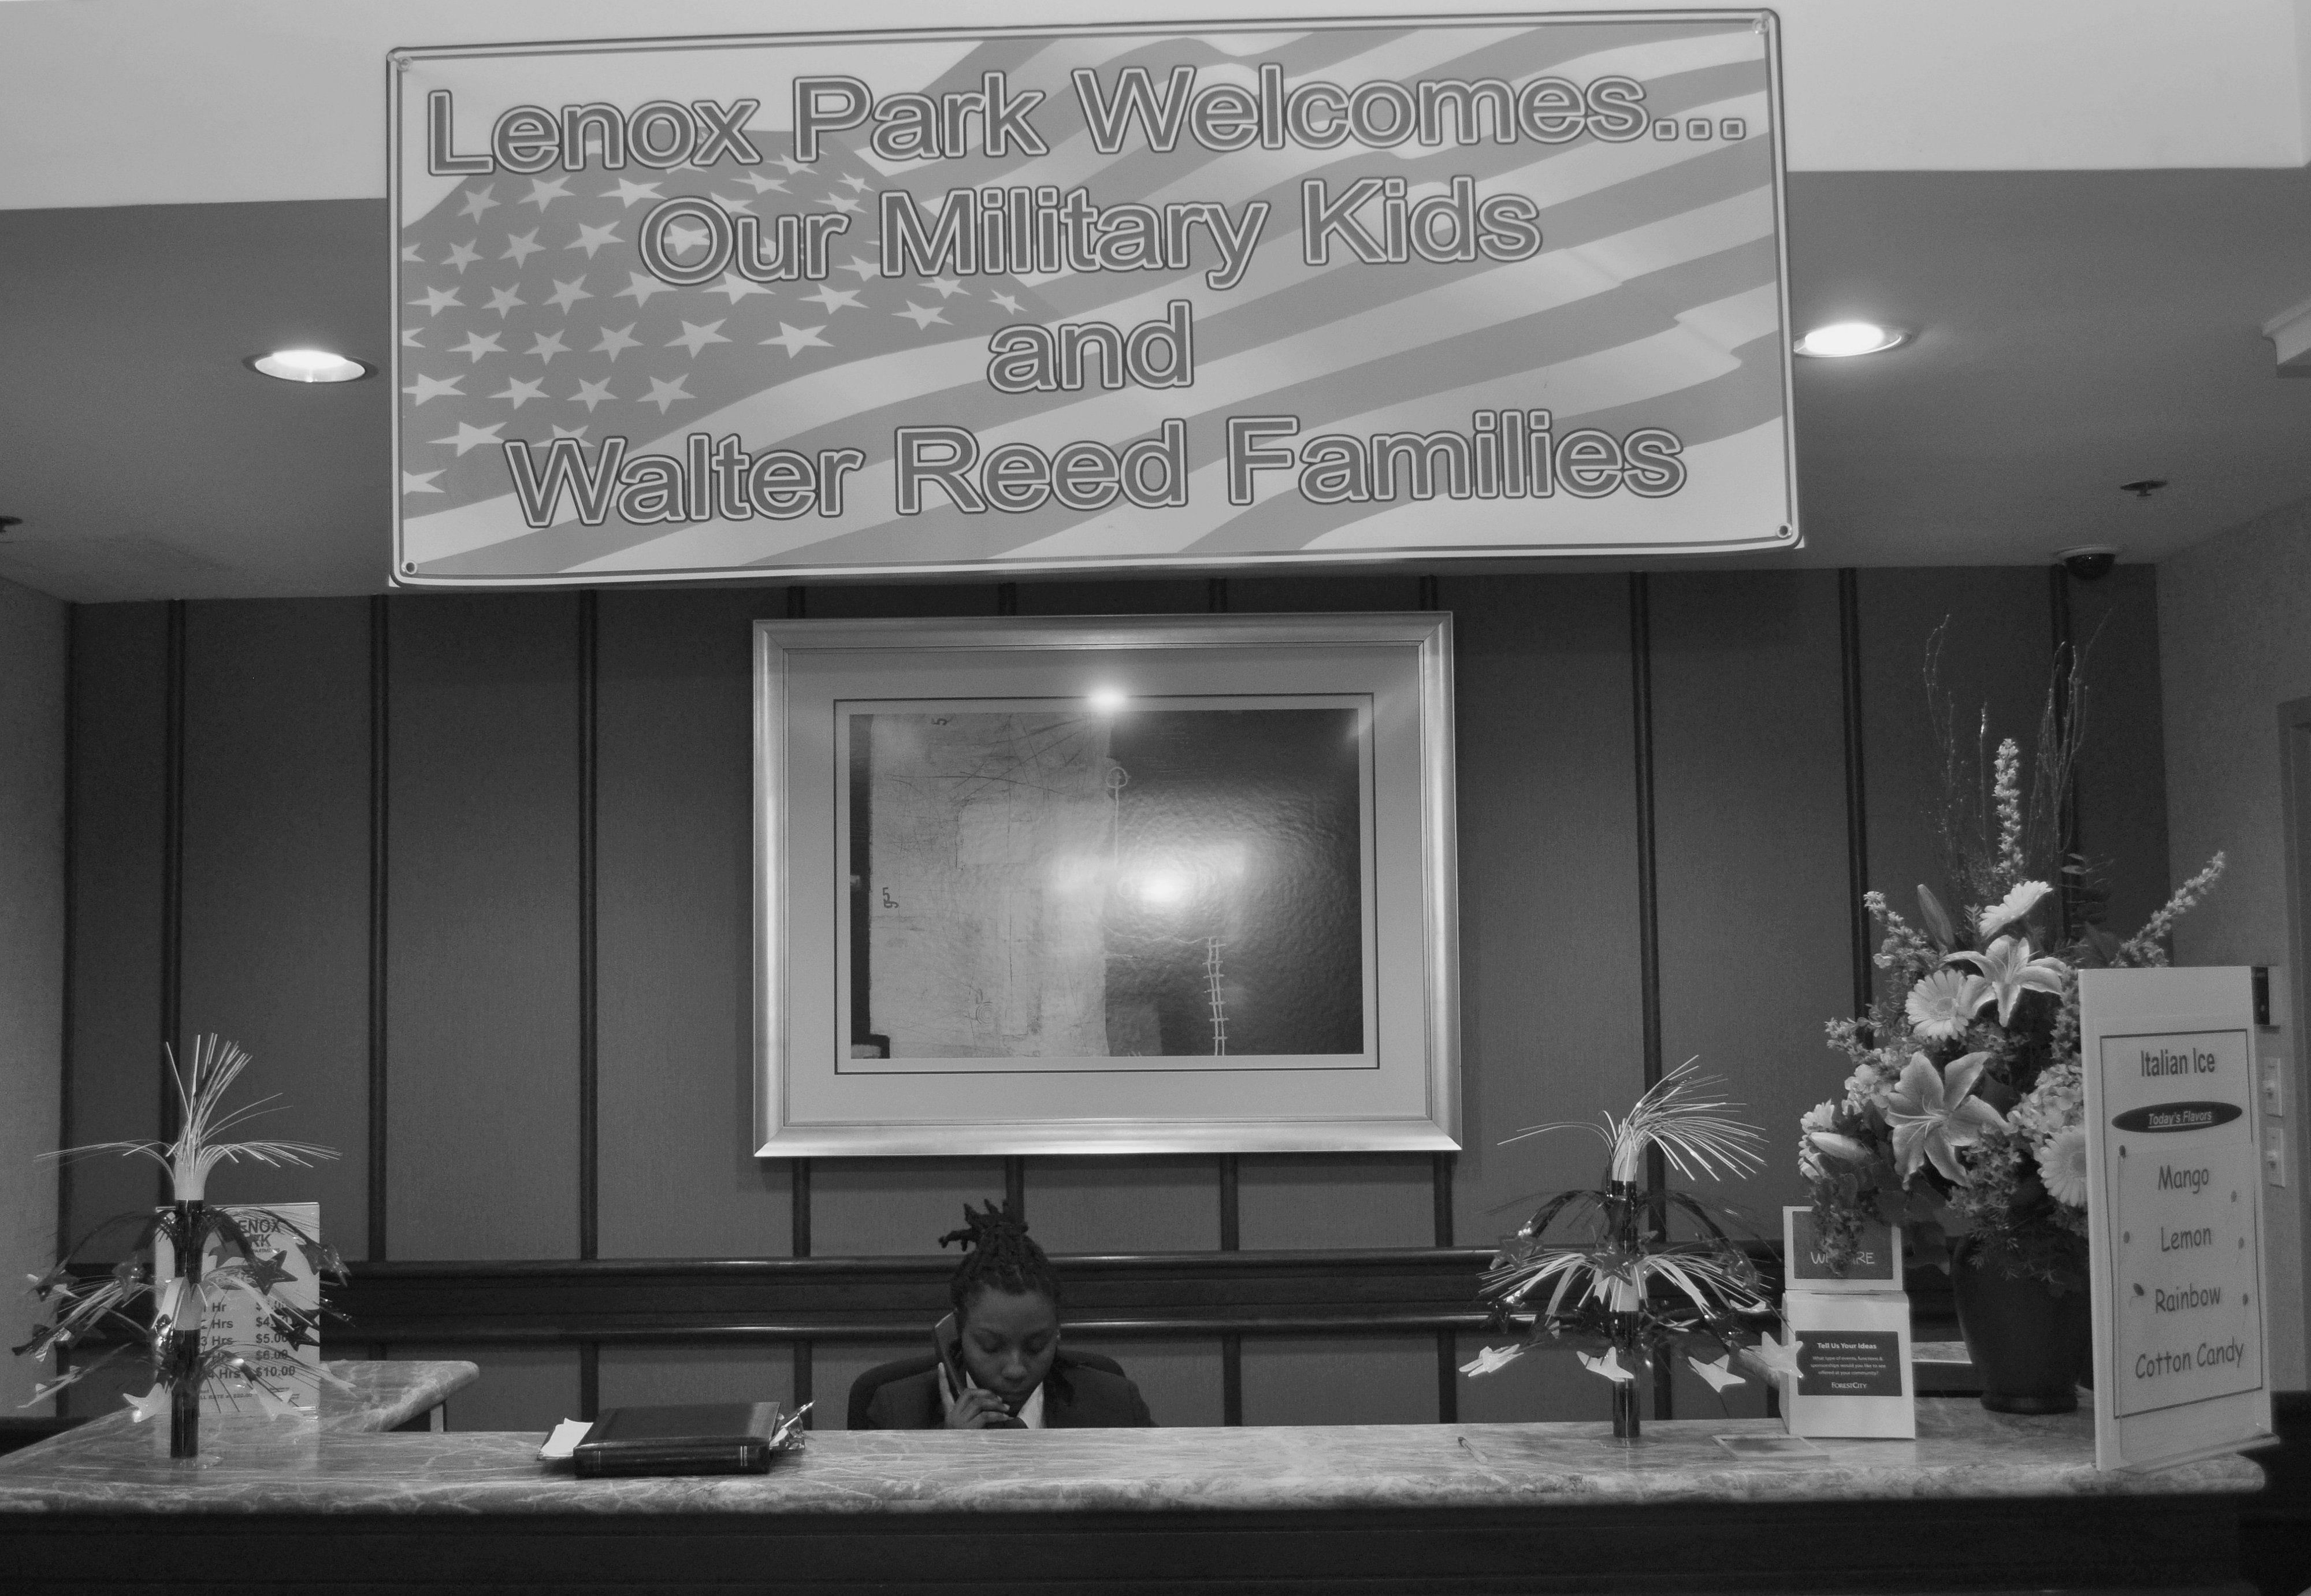 Lenox park lenox military kids home decor decals